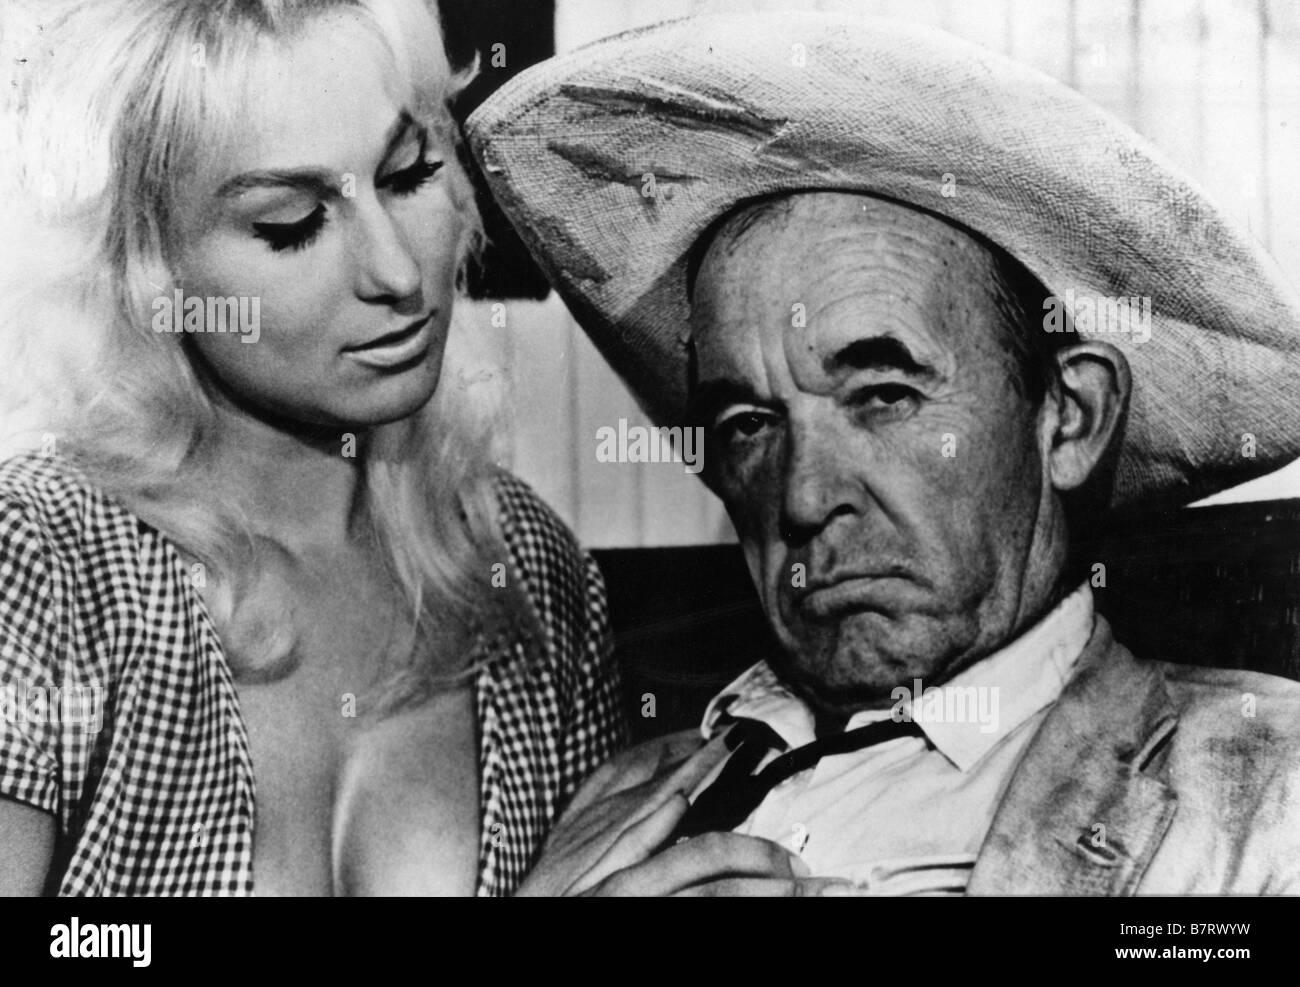 mudhoney year 1965 usa director russ meyer hal hopper antoinette